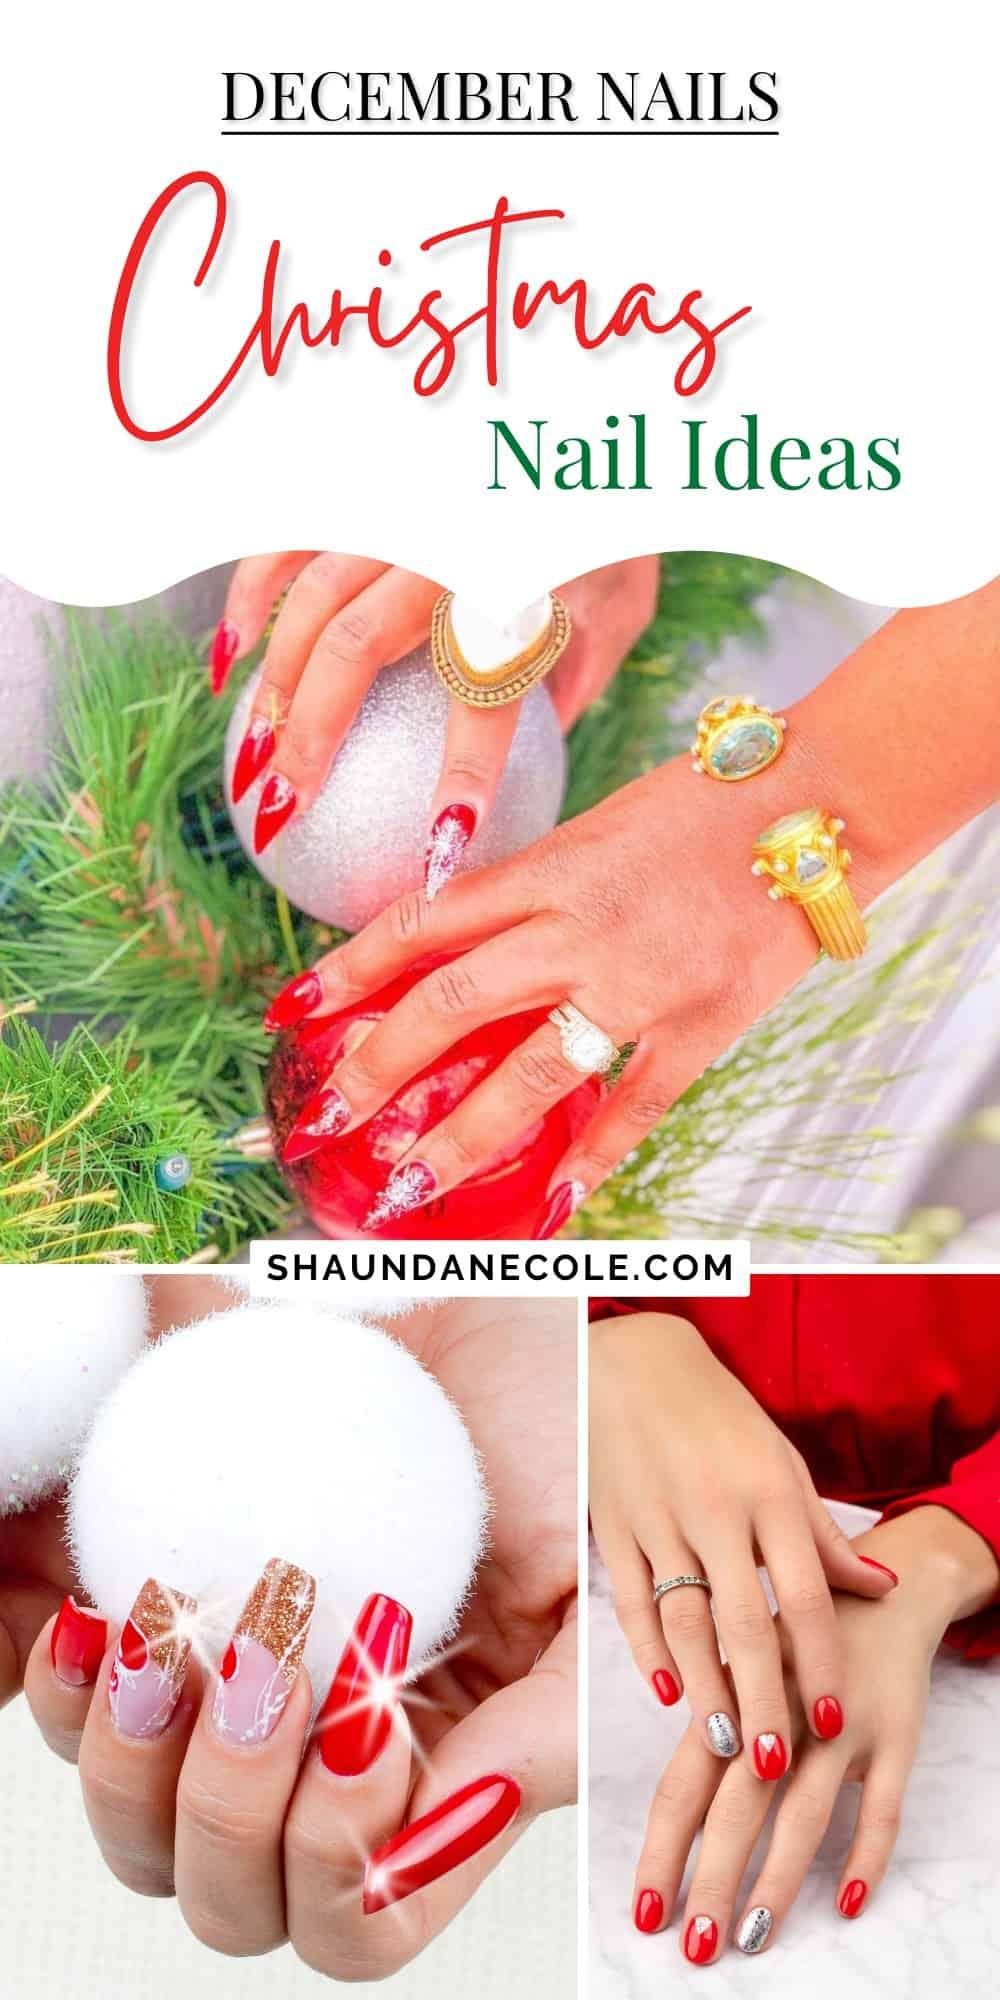 Christmas Nails Ideas & Designs